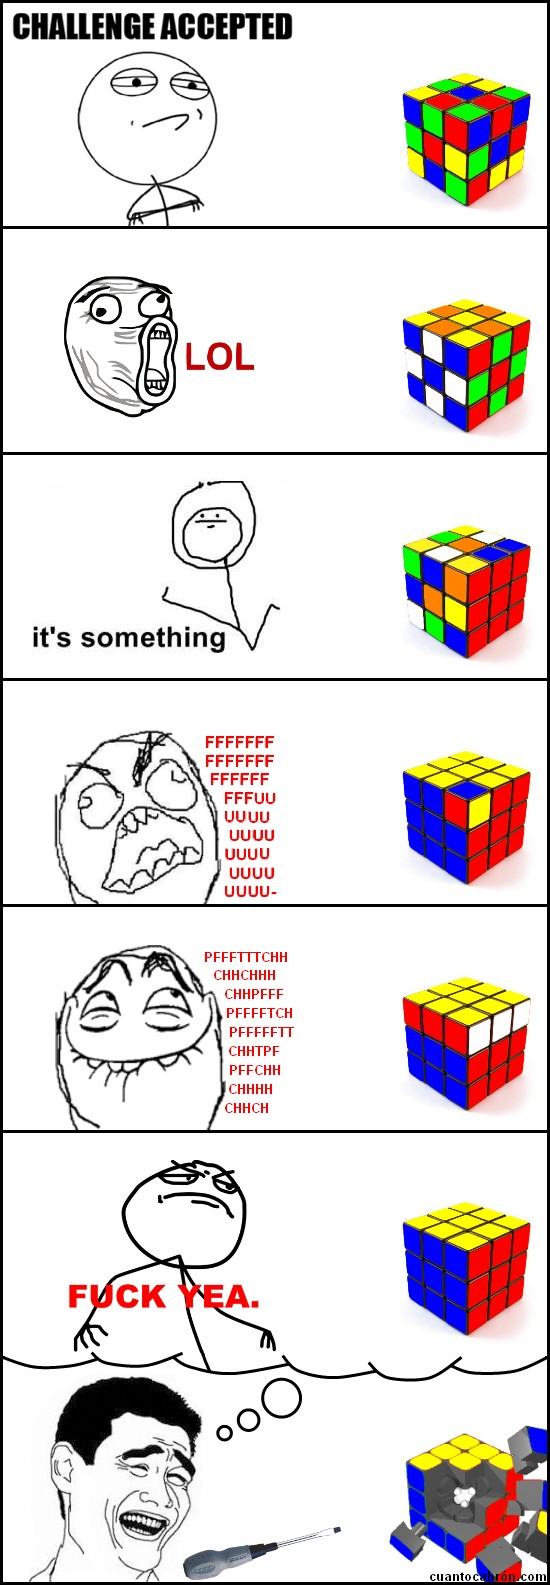 Mix - Resolviendo el Cubo Rubik